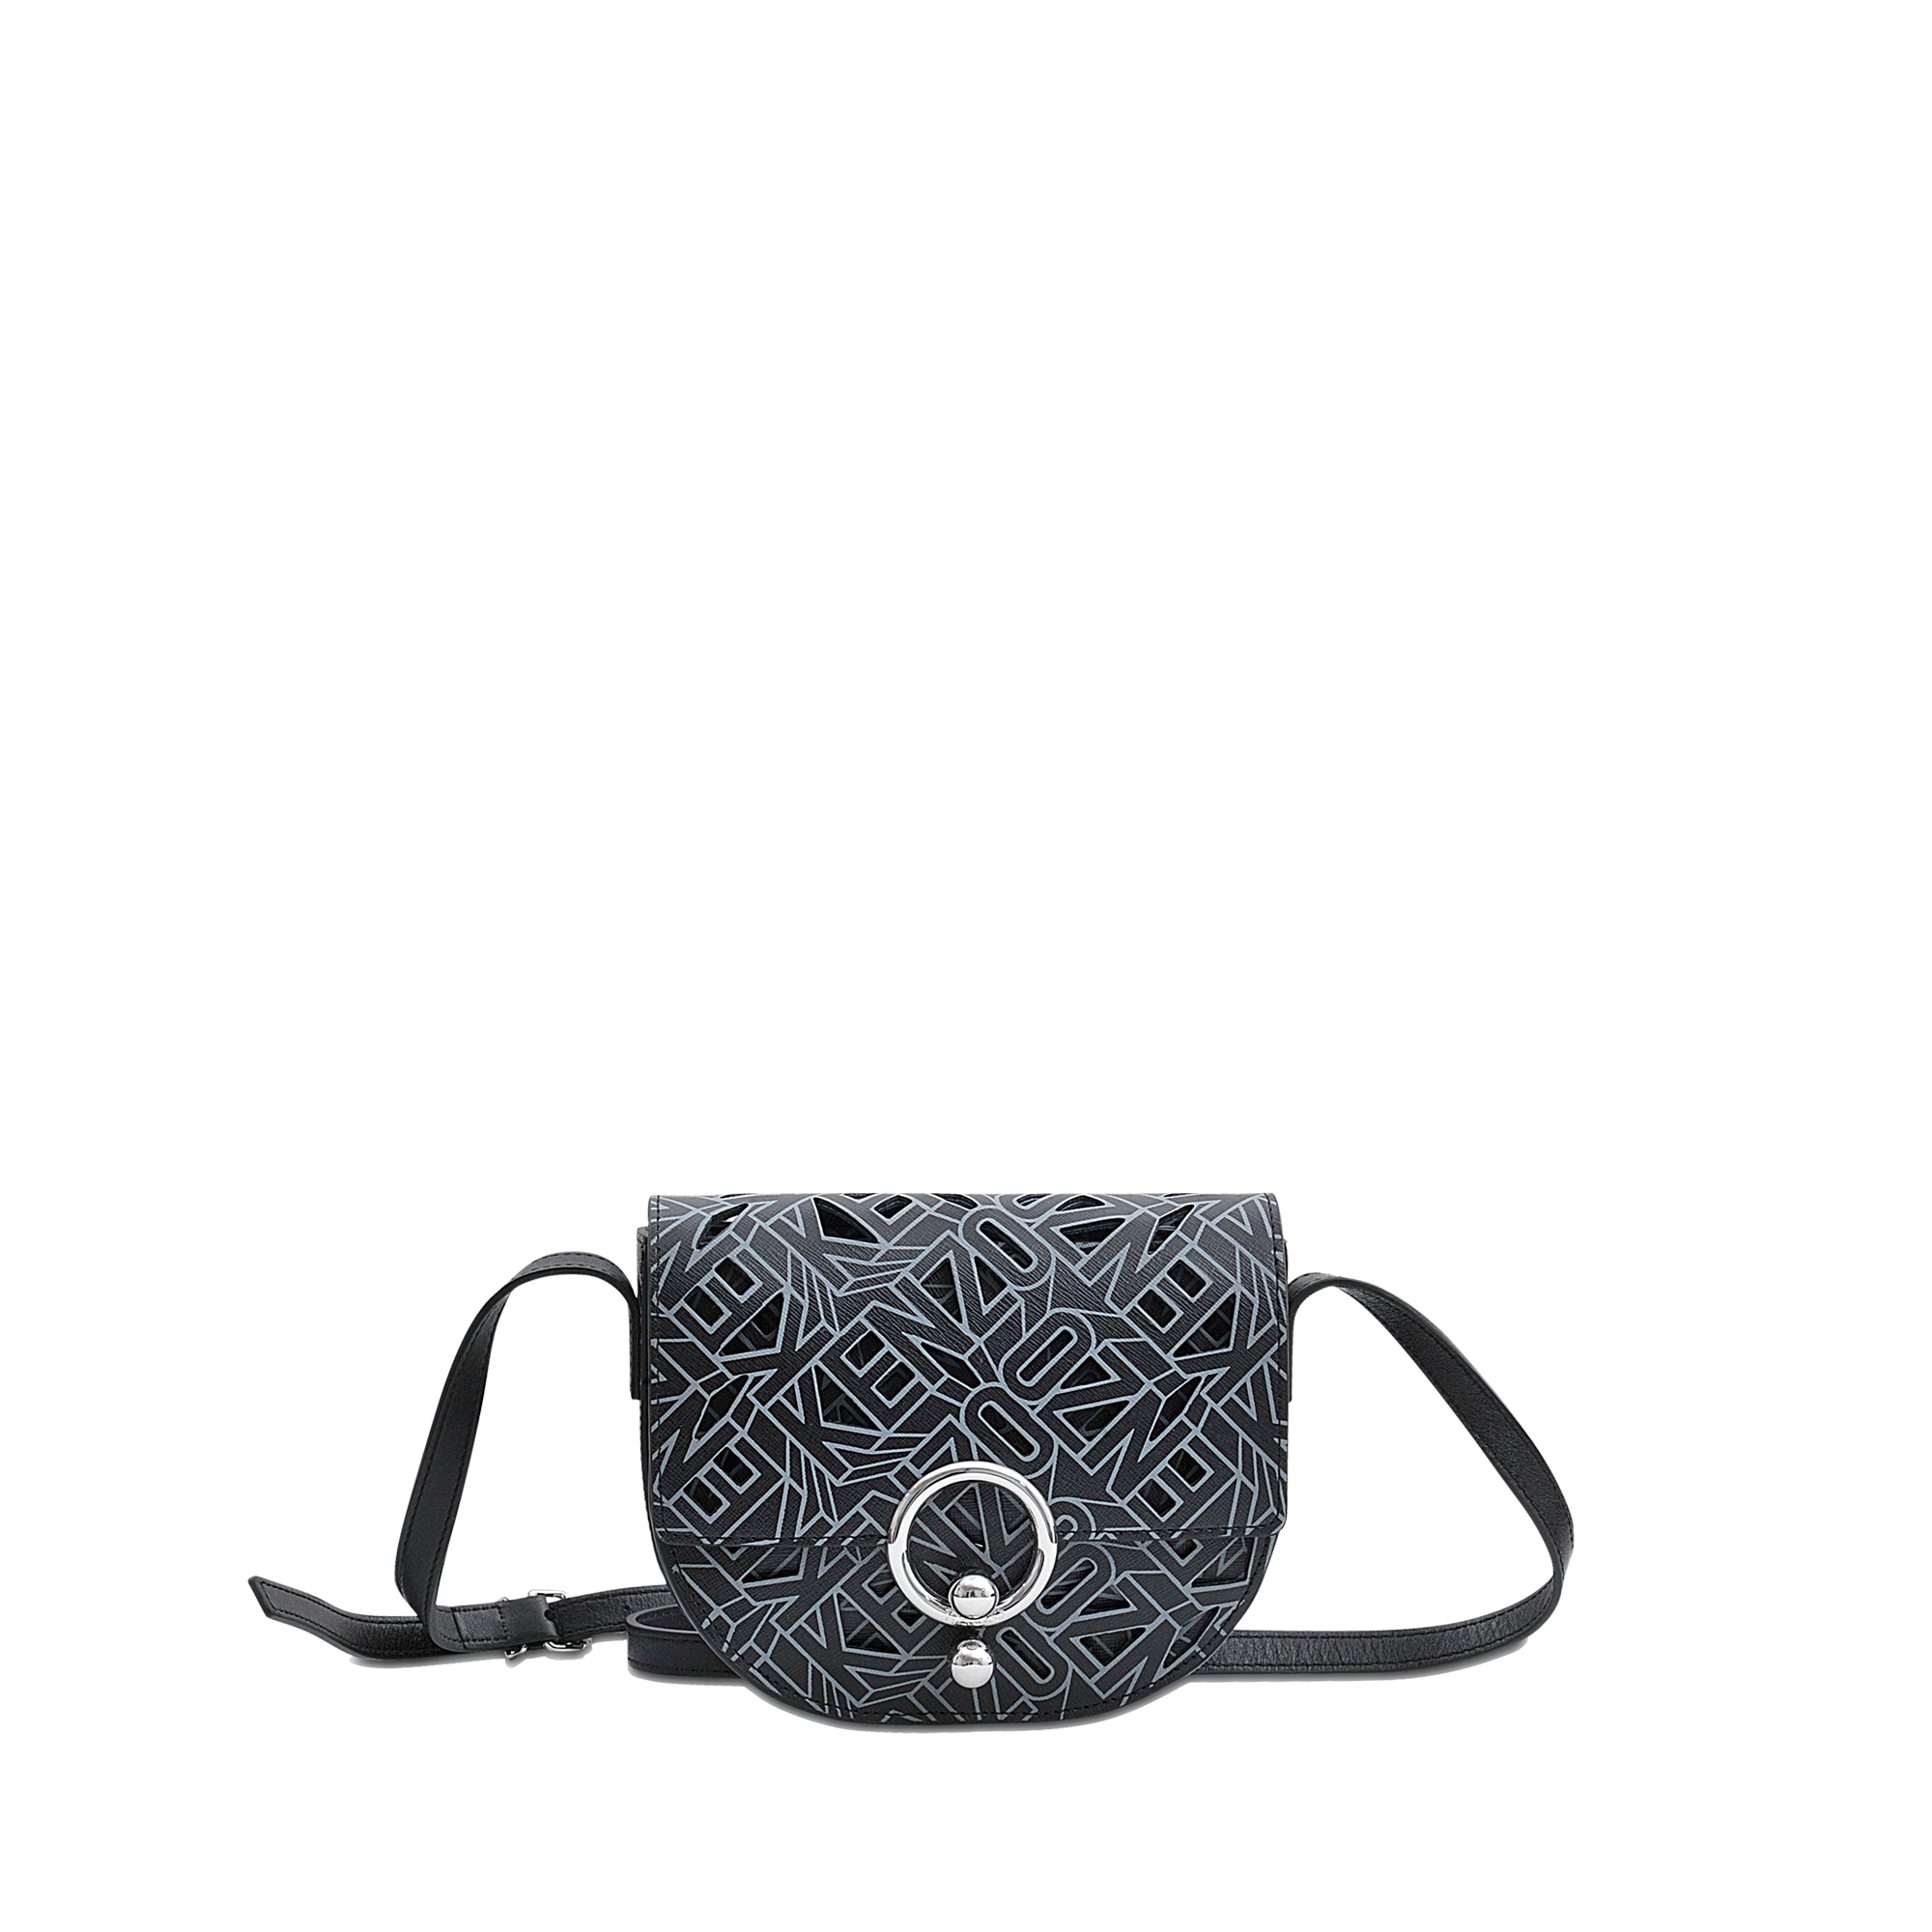 eb363b4cb0c KENZO Piercing Flying Logo Bag in Black - Lyst